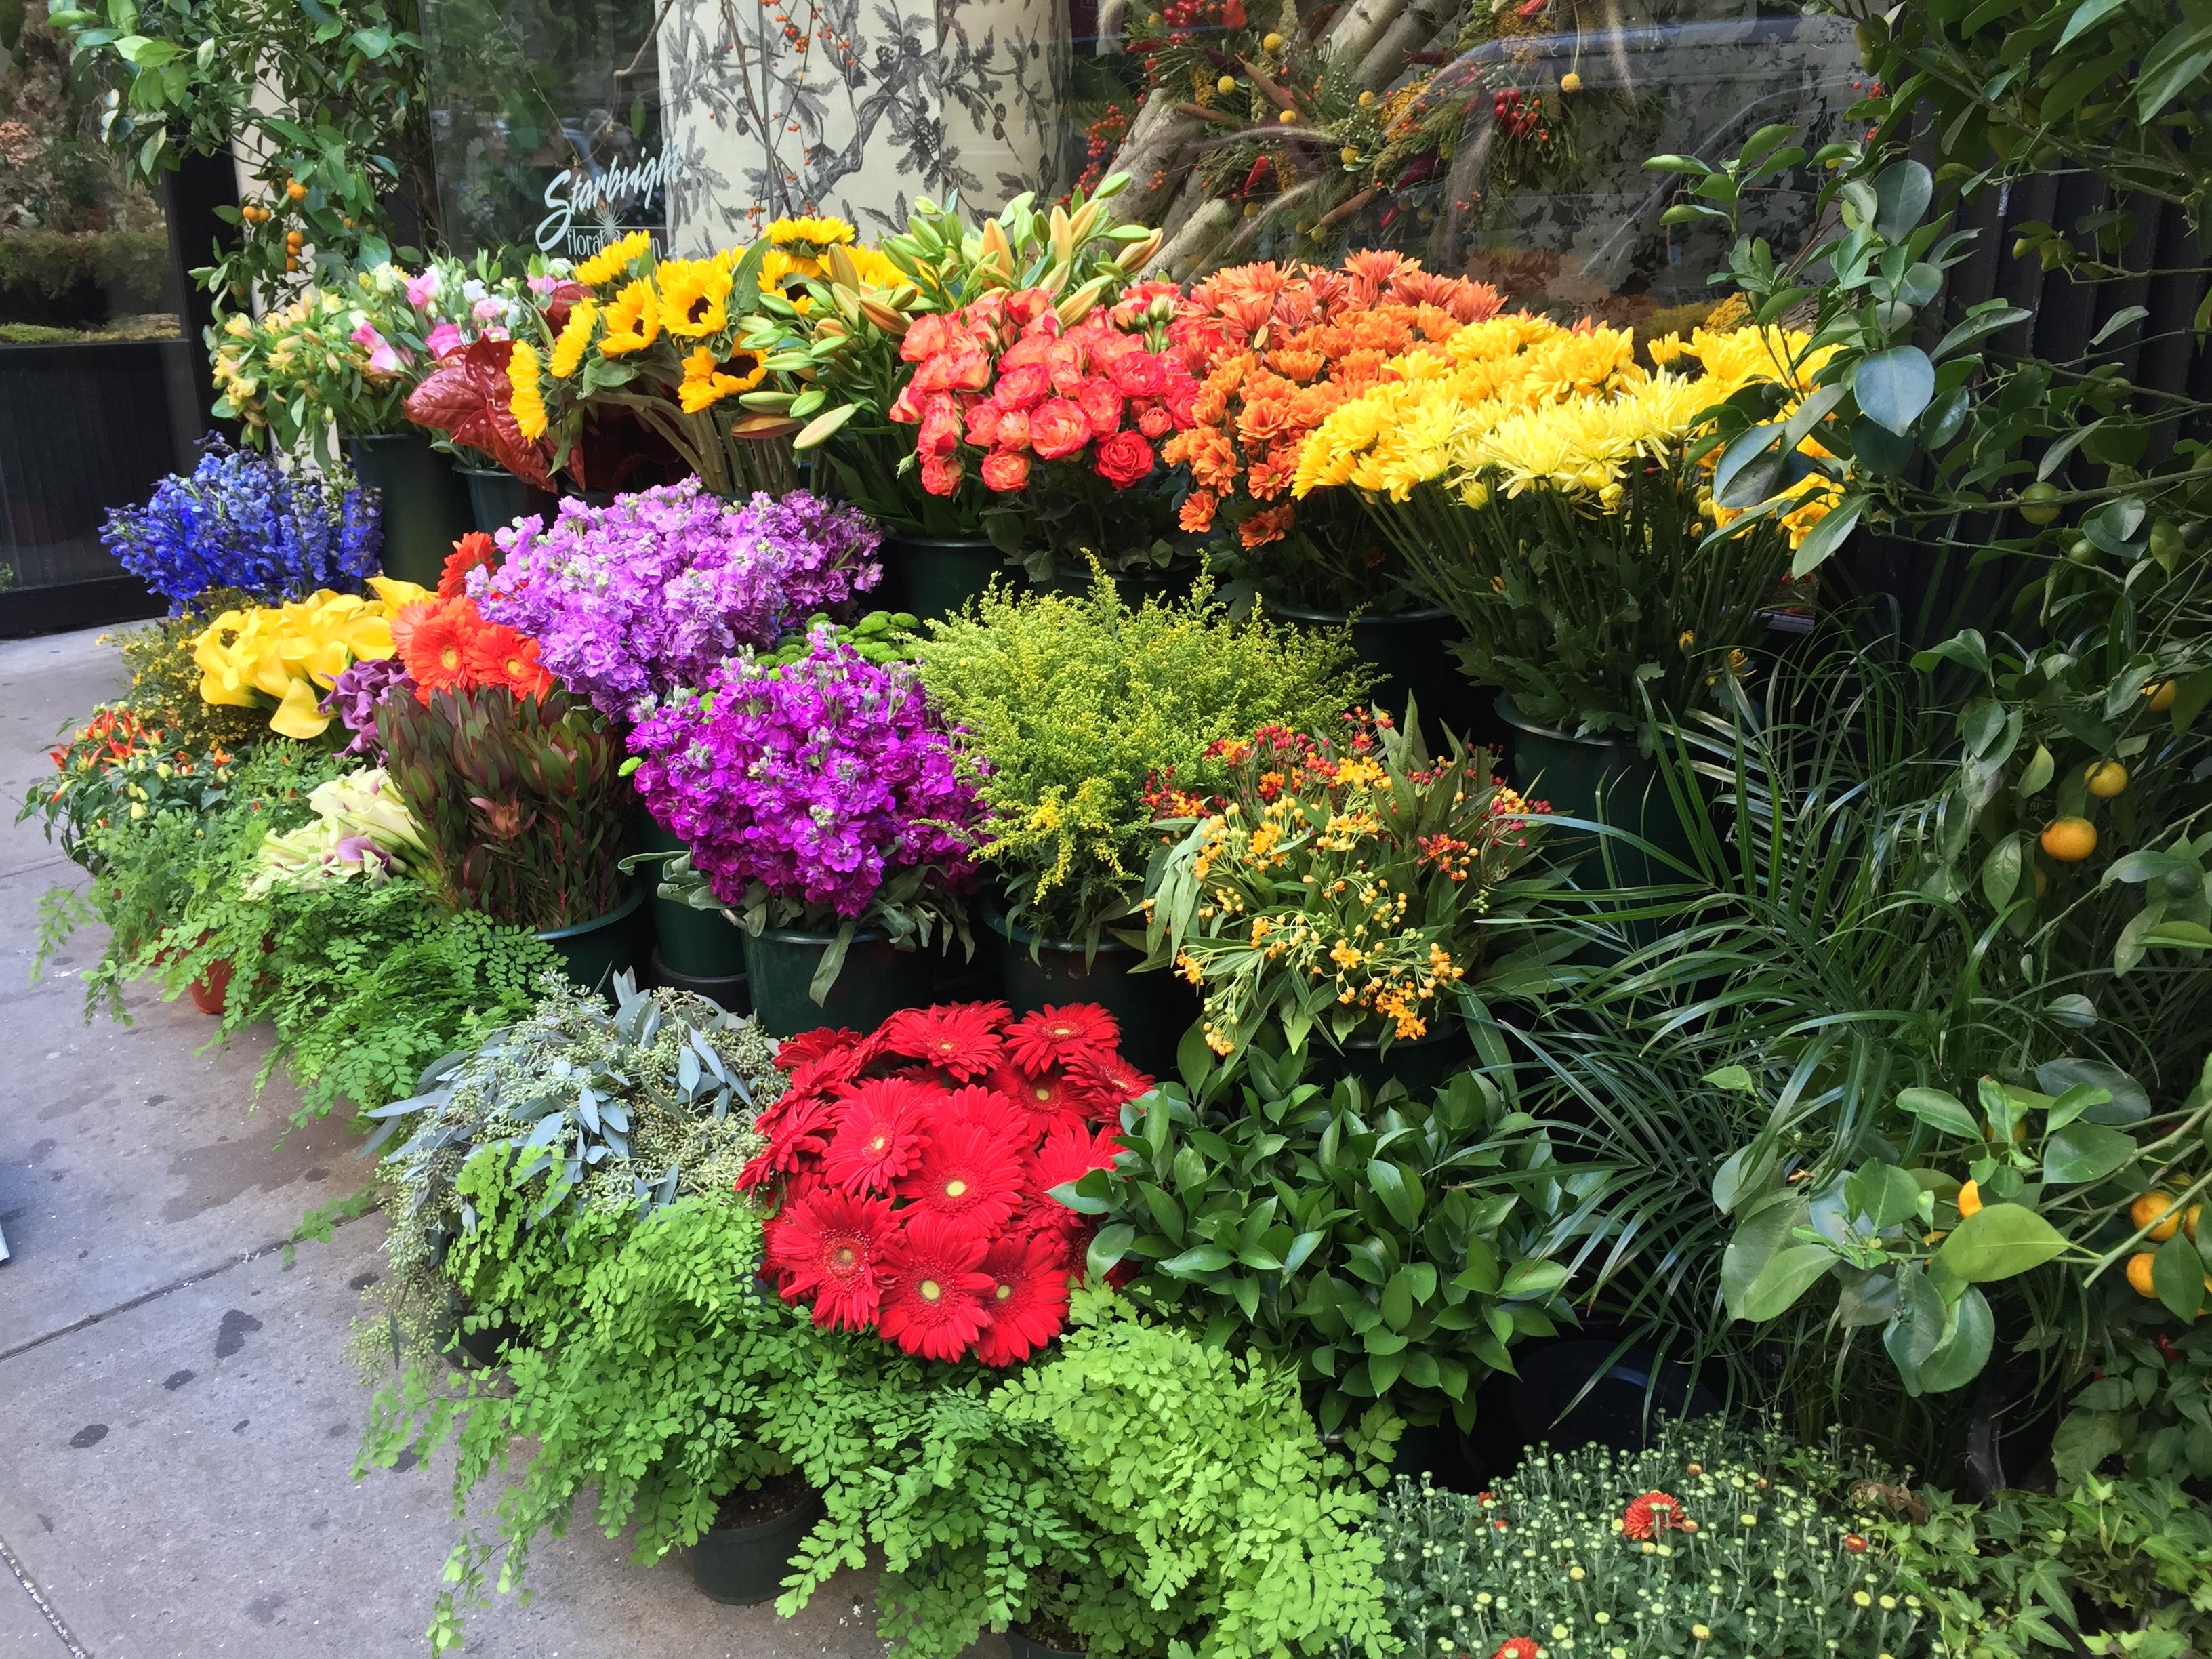 Starbright Floral Design in New York NY 212 229 1